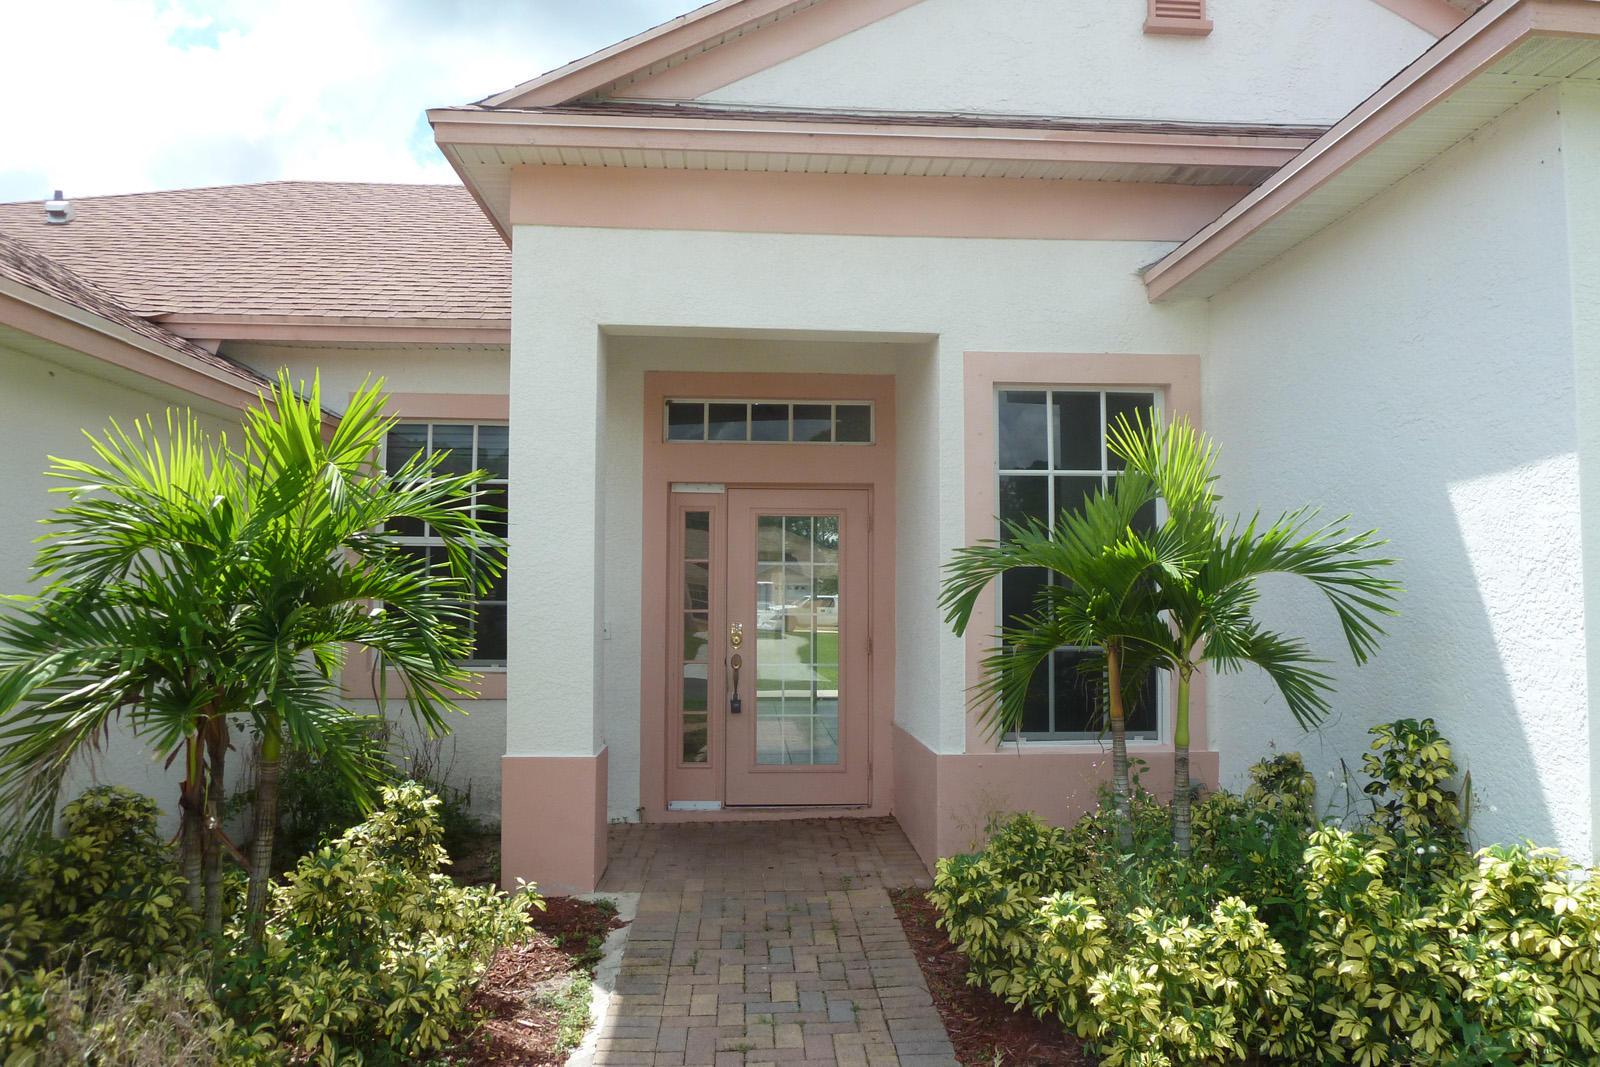 1792 Sw Starman Avenue, Port Saint Lucie, FL 34953